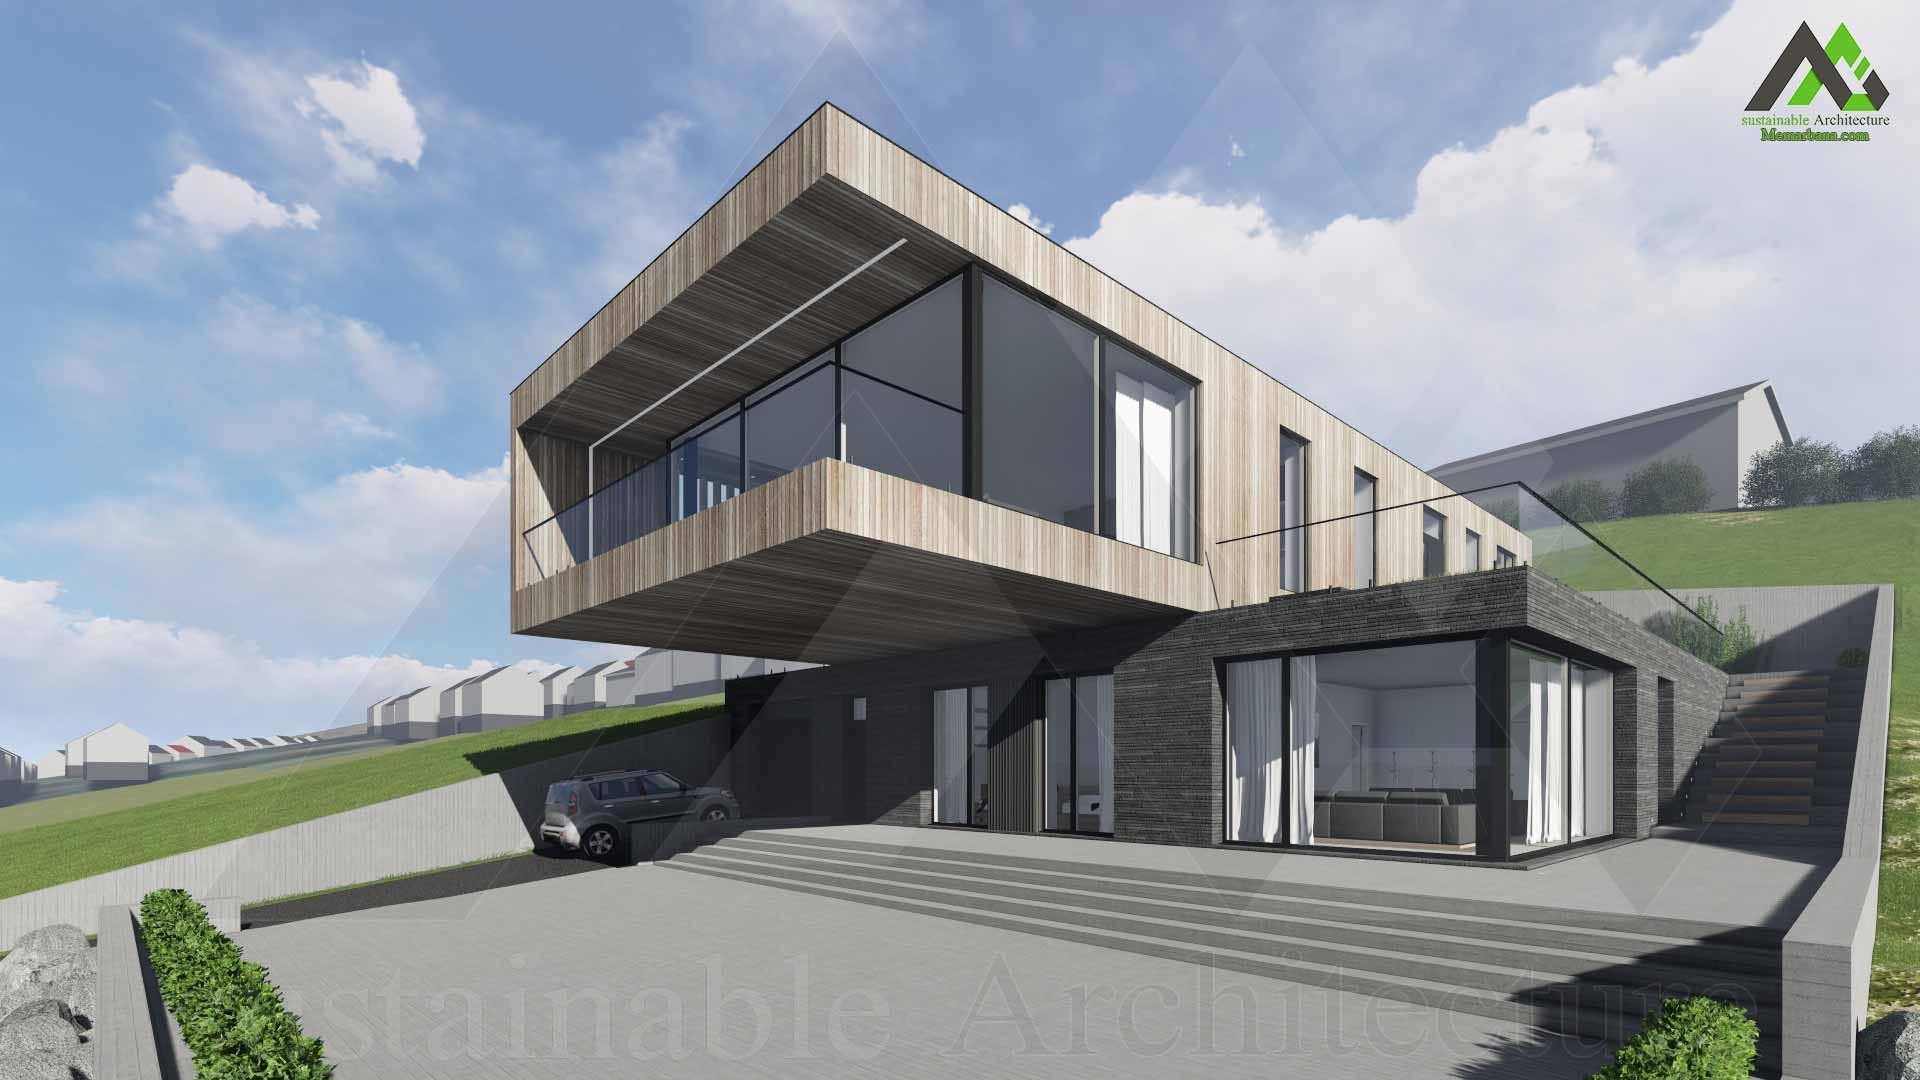 پلان خانه ویلایی اجرایی دو طبقه